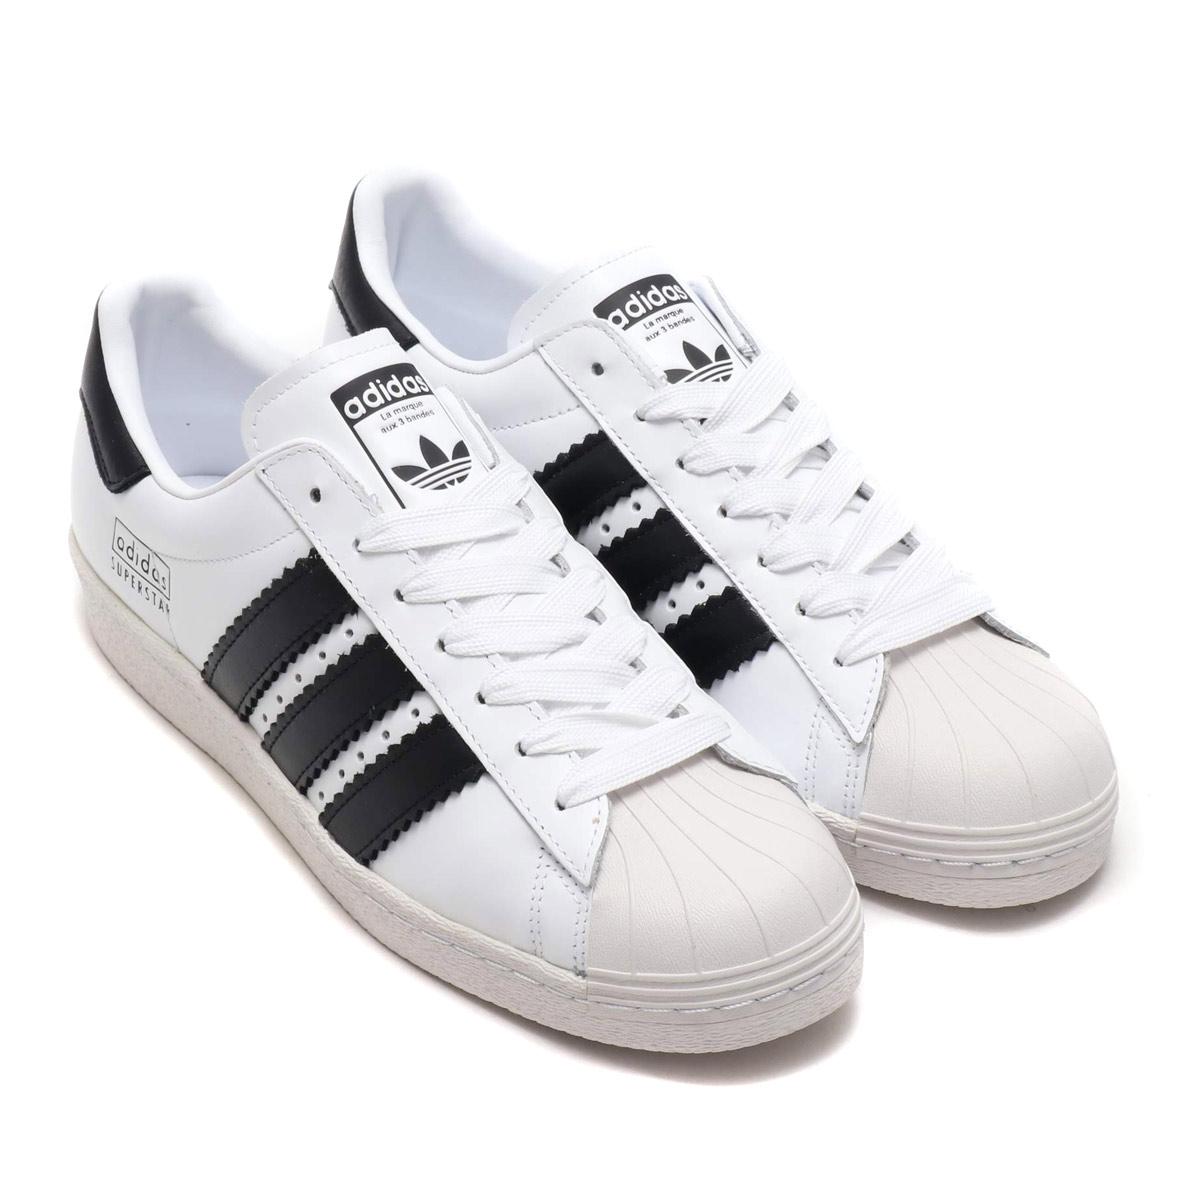 adidas Originals SUPERSTAR 80s (アディダスオリジナルス スーパースター 80s)RUNNING WHITE/CORE BLACK/WHITE【メンズ レディース スニーカー】19SS-I